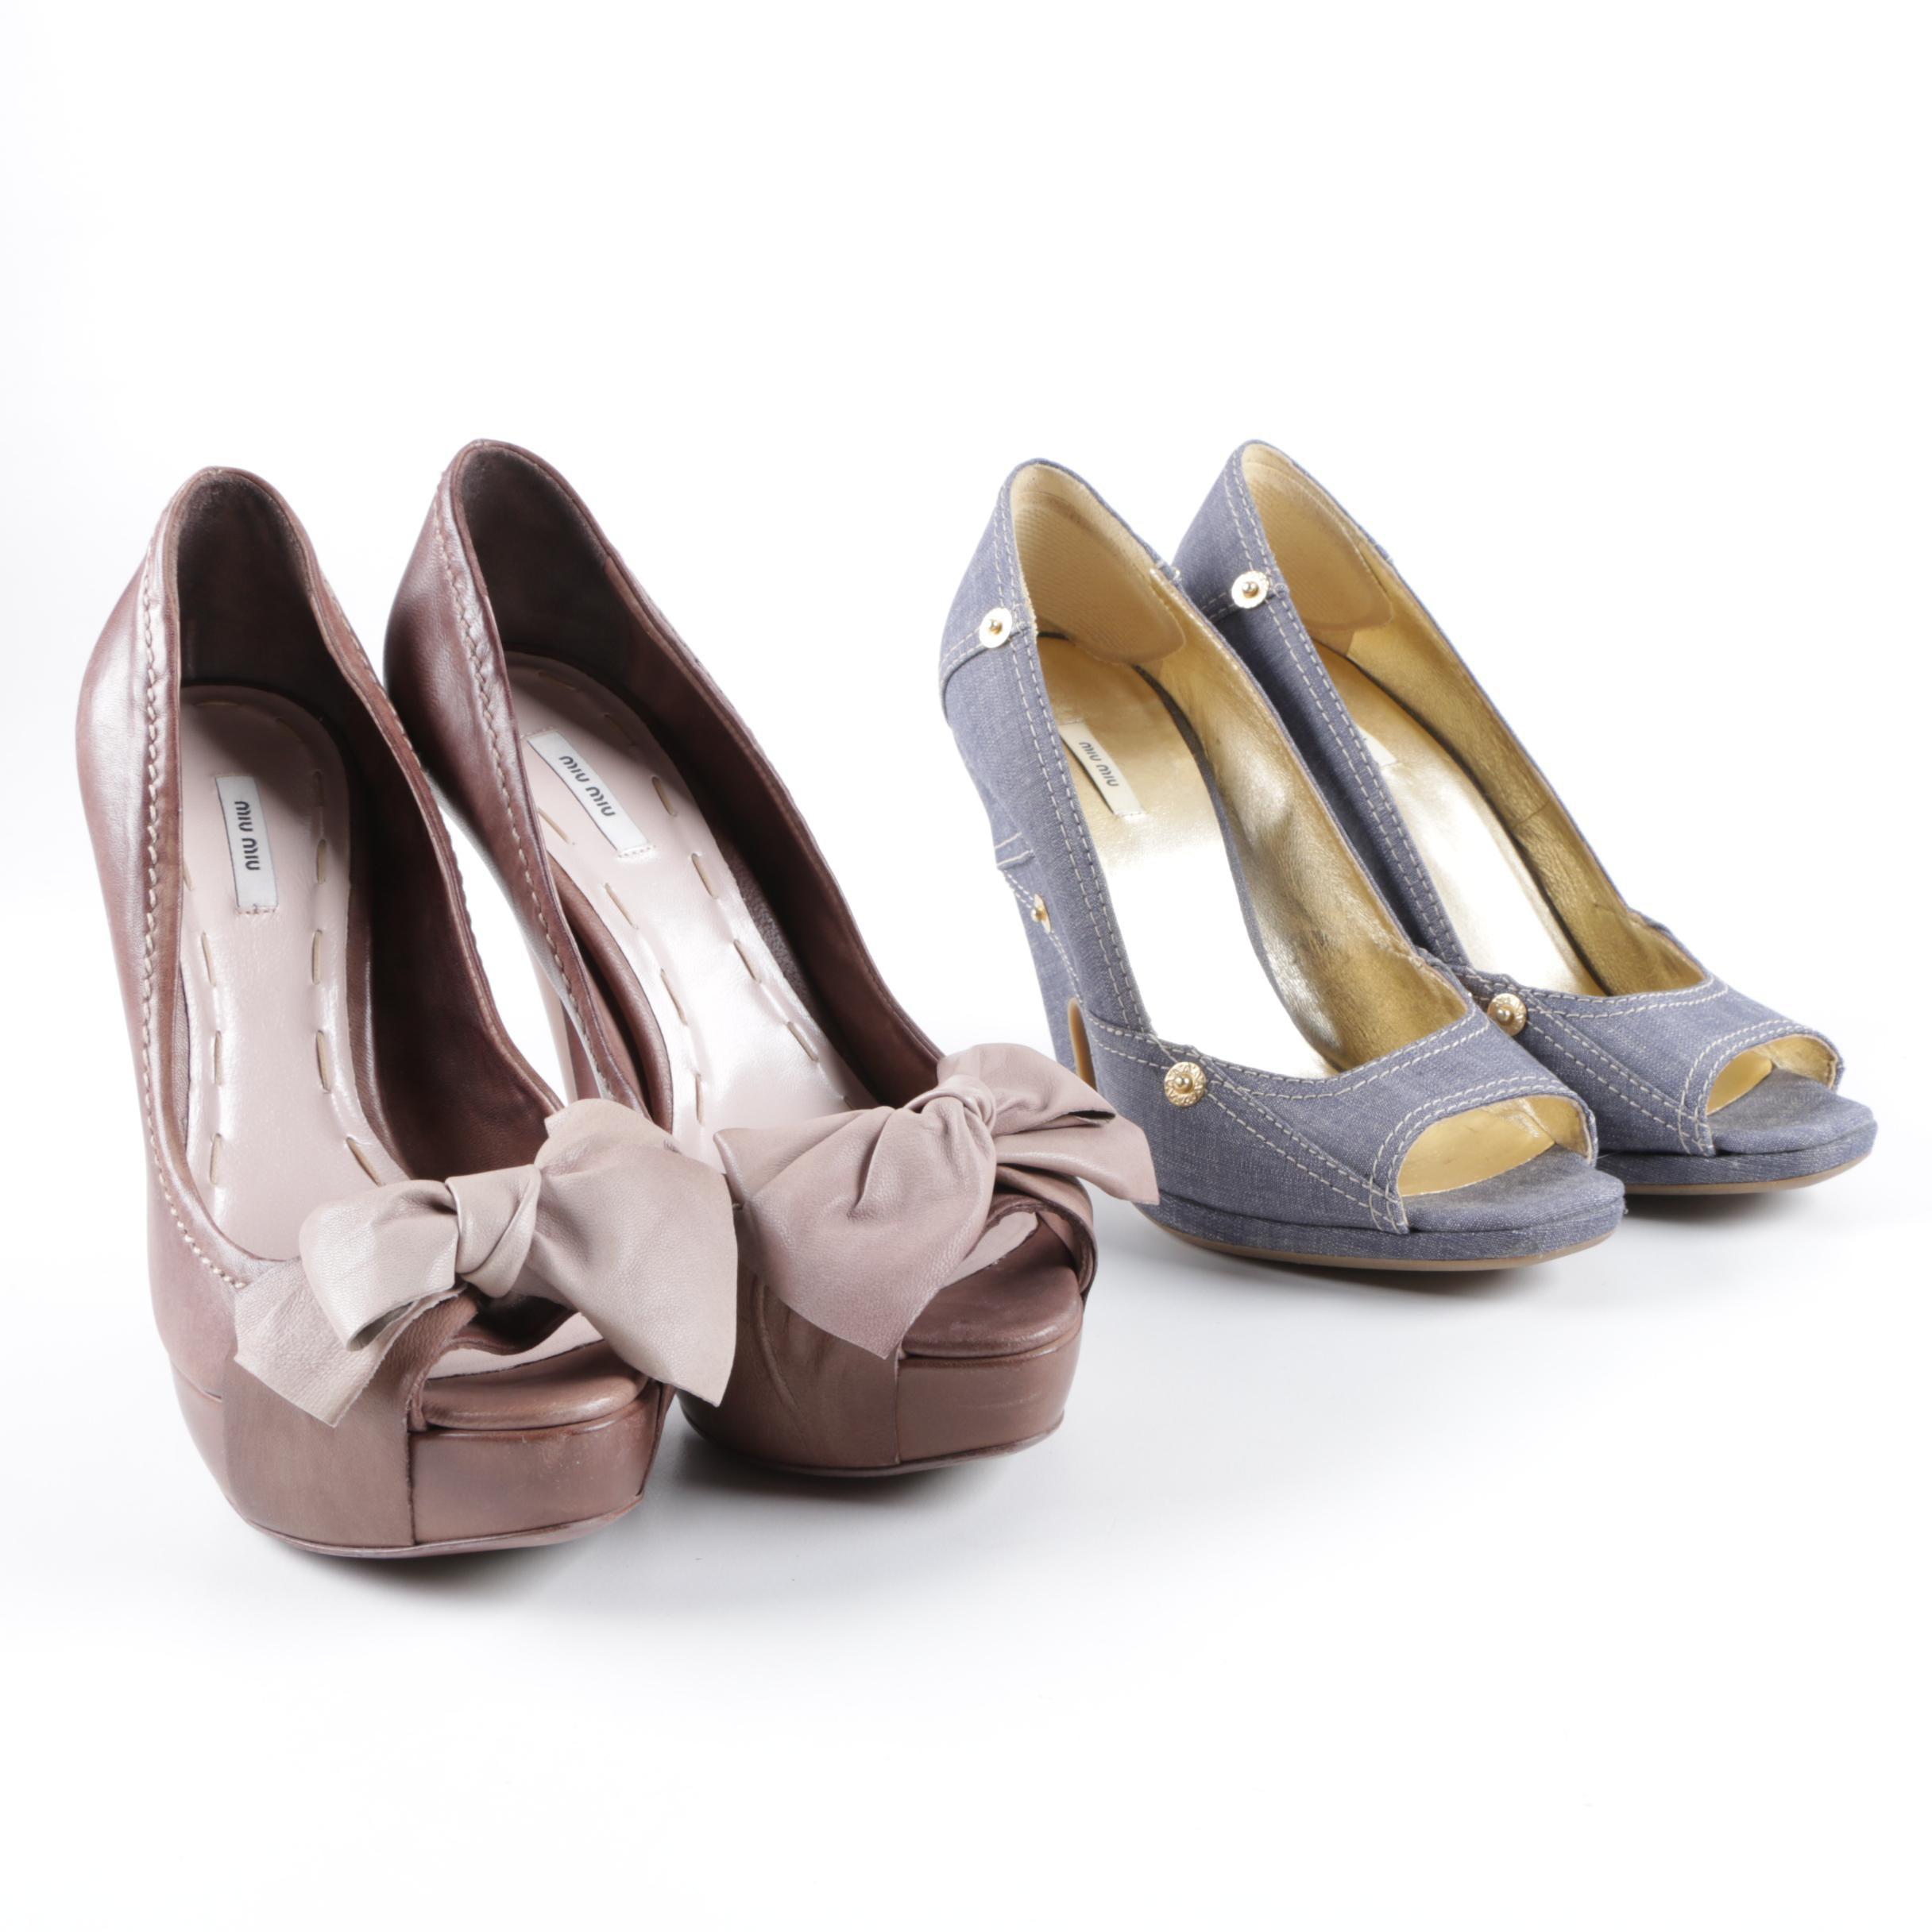 Two Pairs of Miu Miu Heels